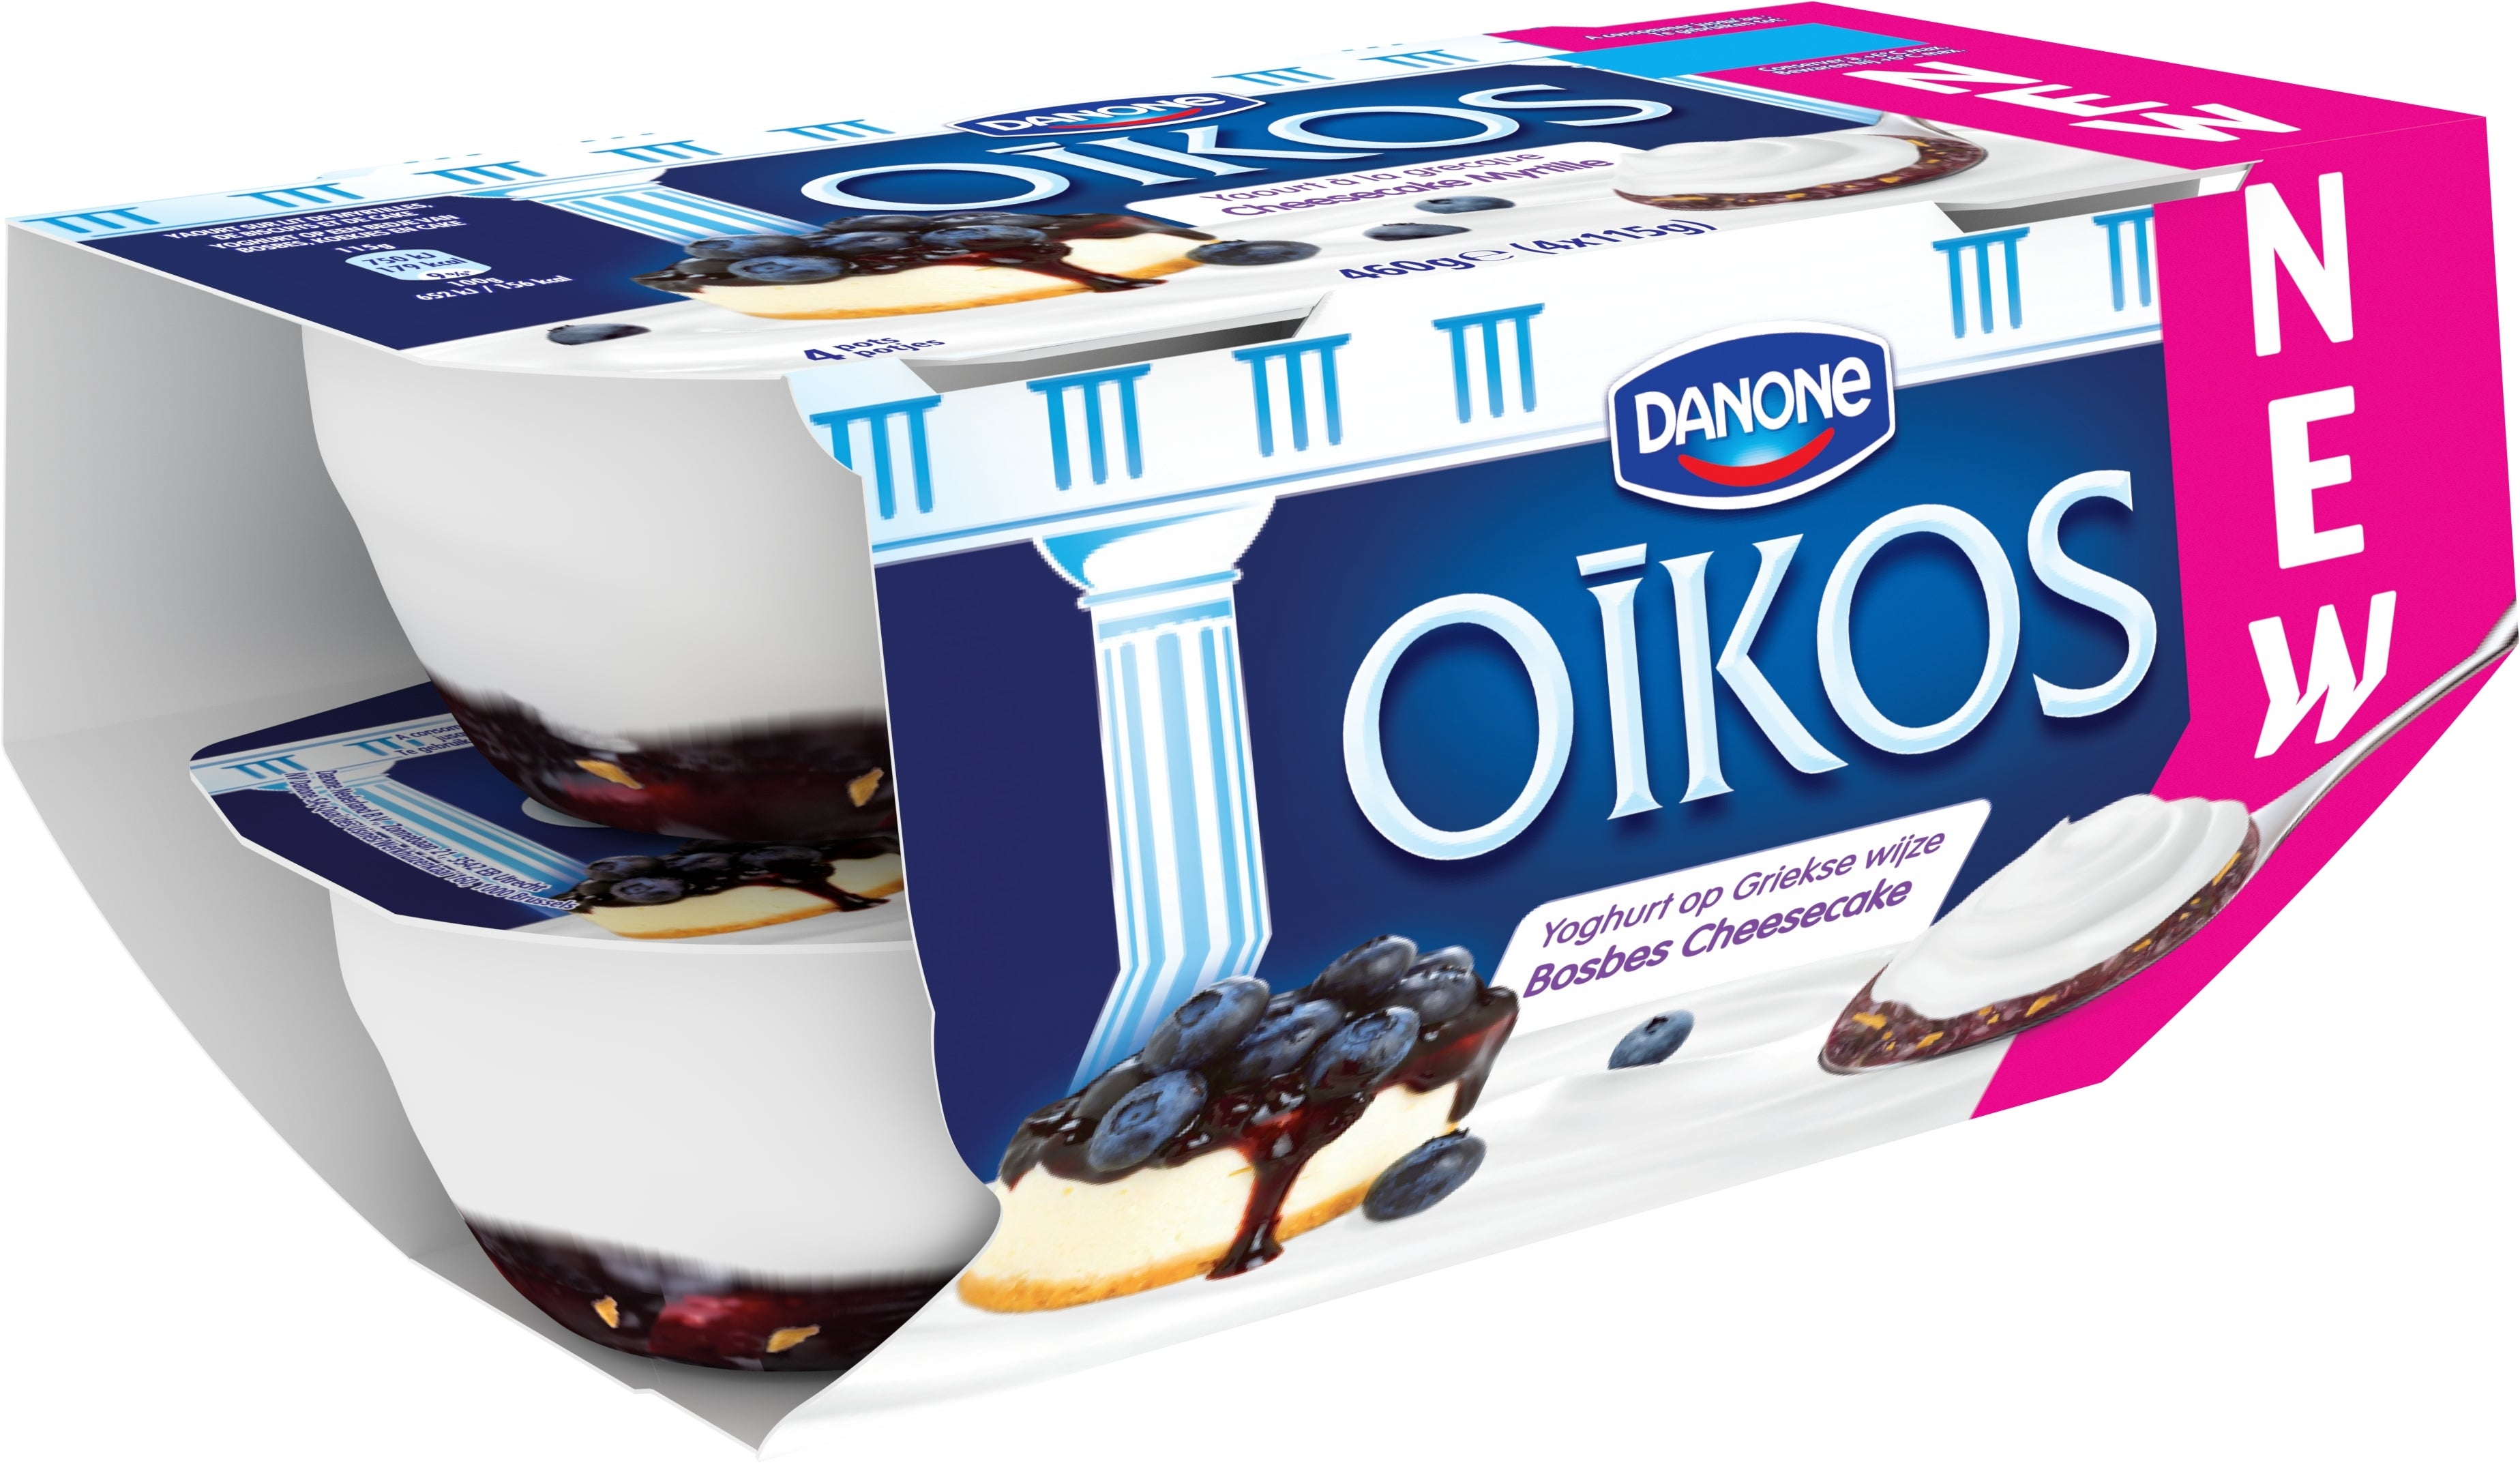 Oikos Volle Yoghurt Cheesecake Bosbes Smaak 4x115g